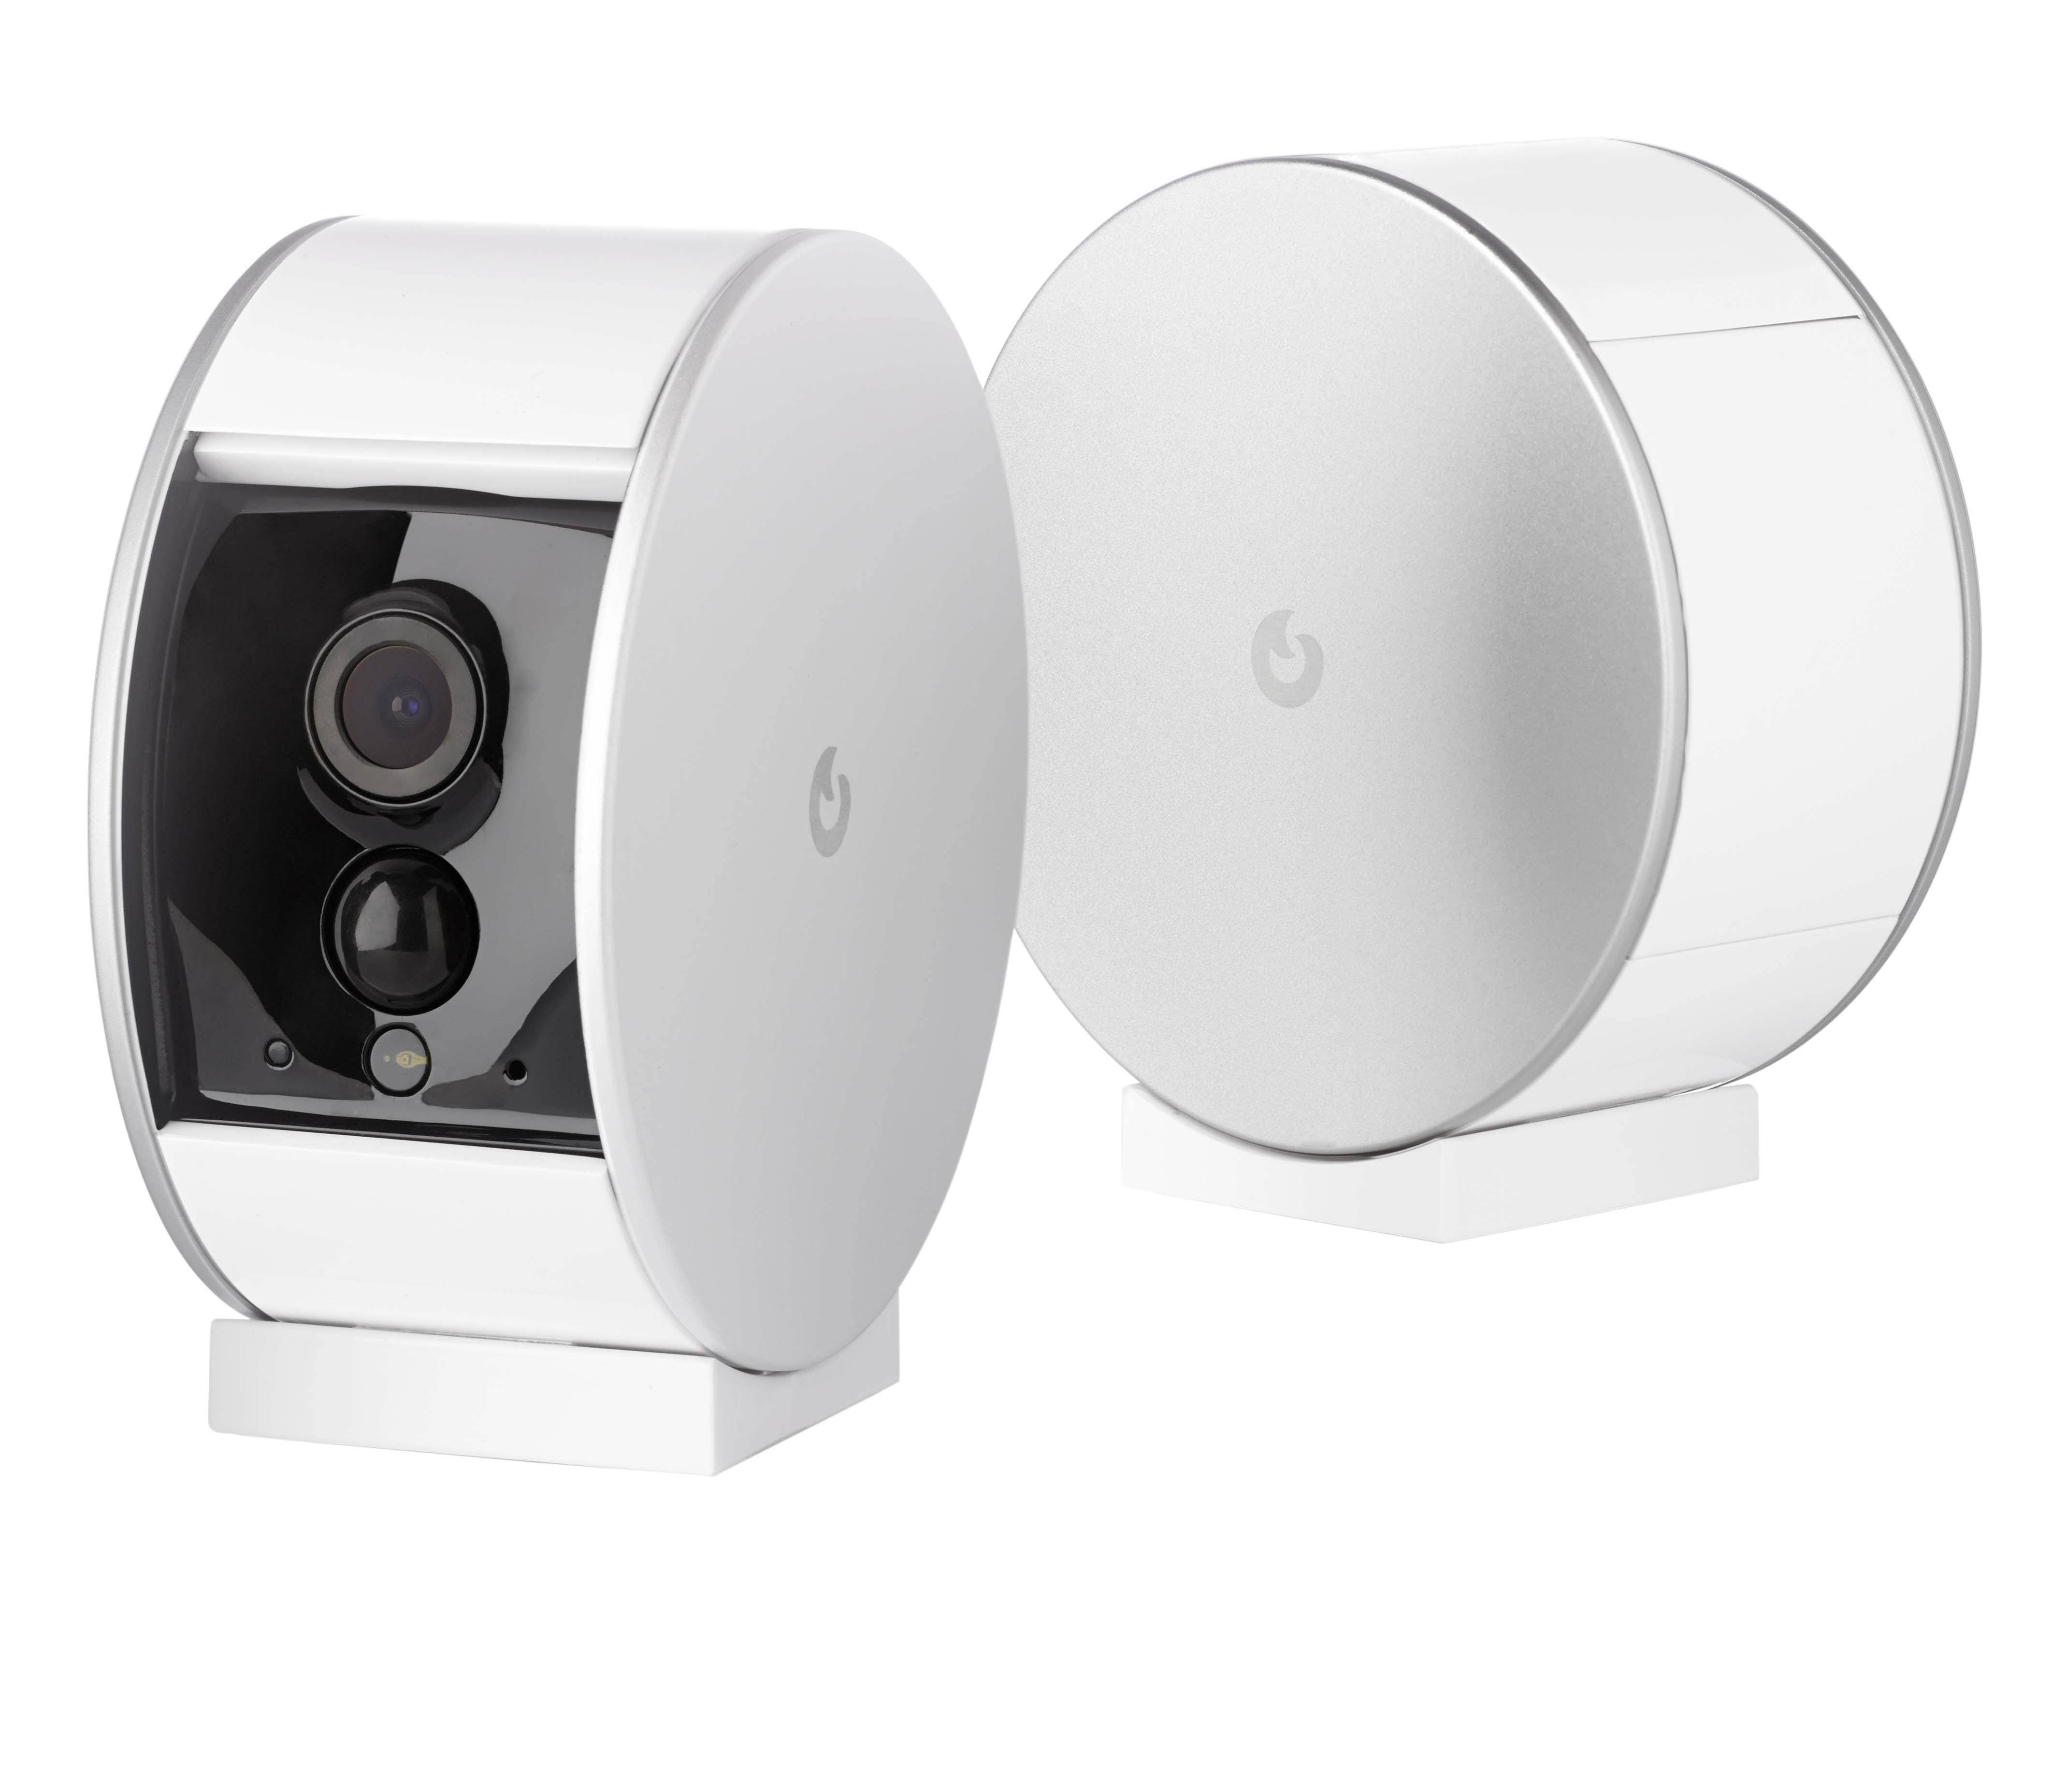 Myfox Security Camera 2